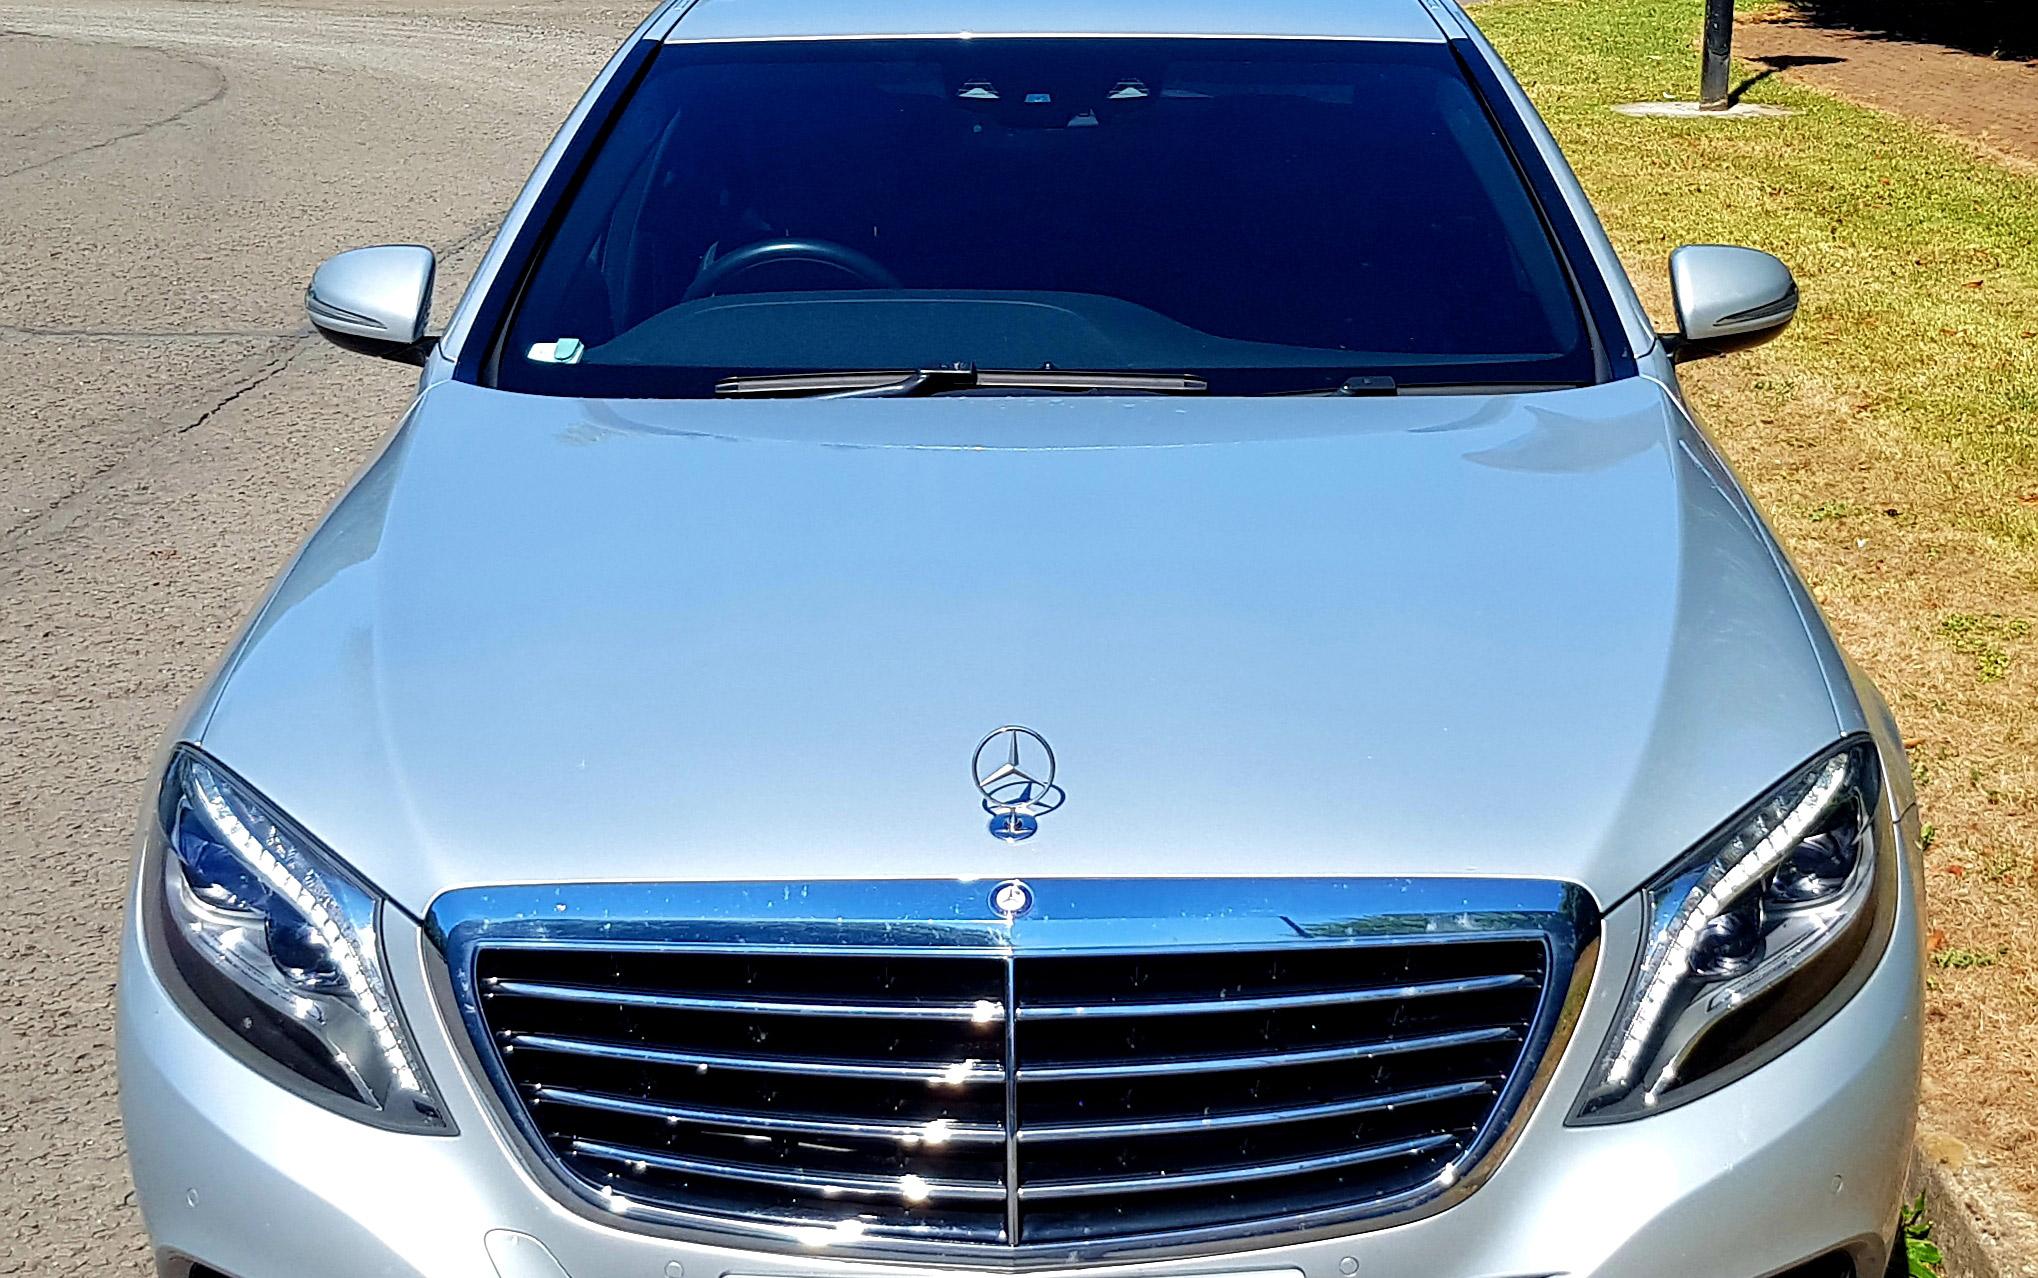 Silver Mercedes Front Shot